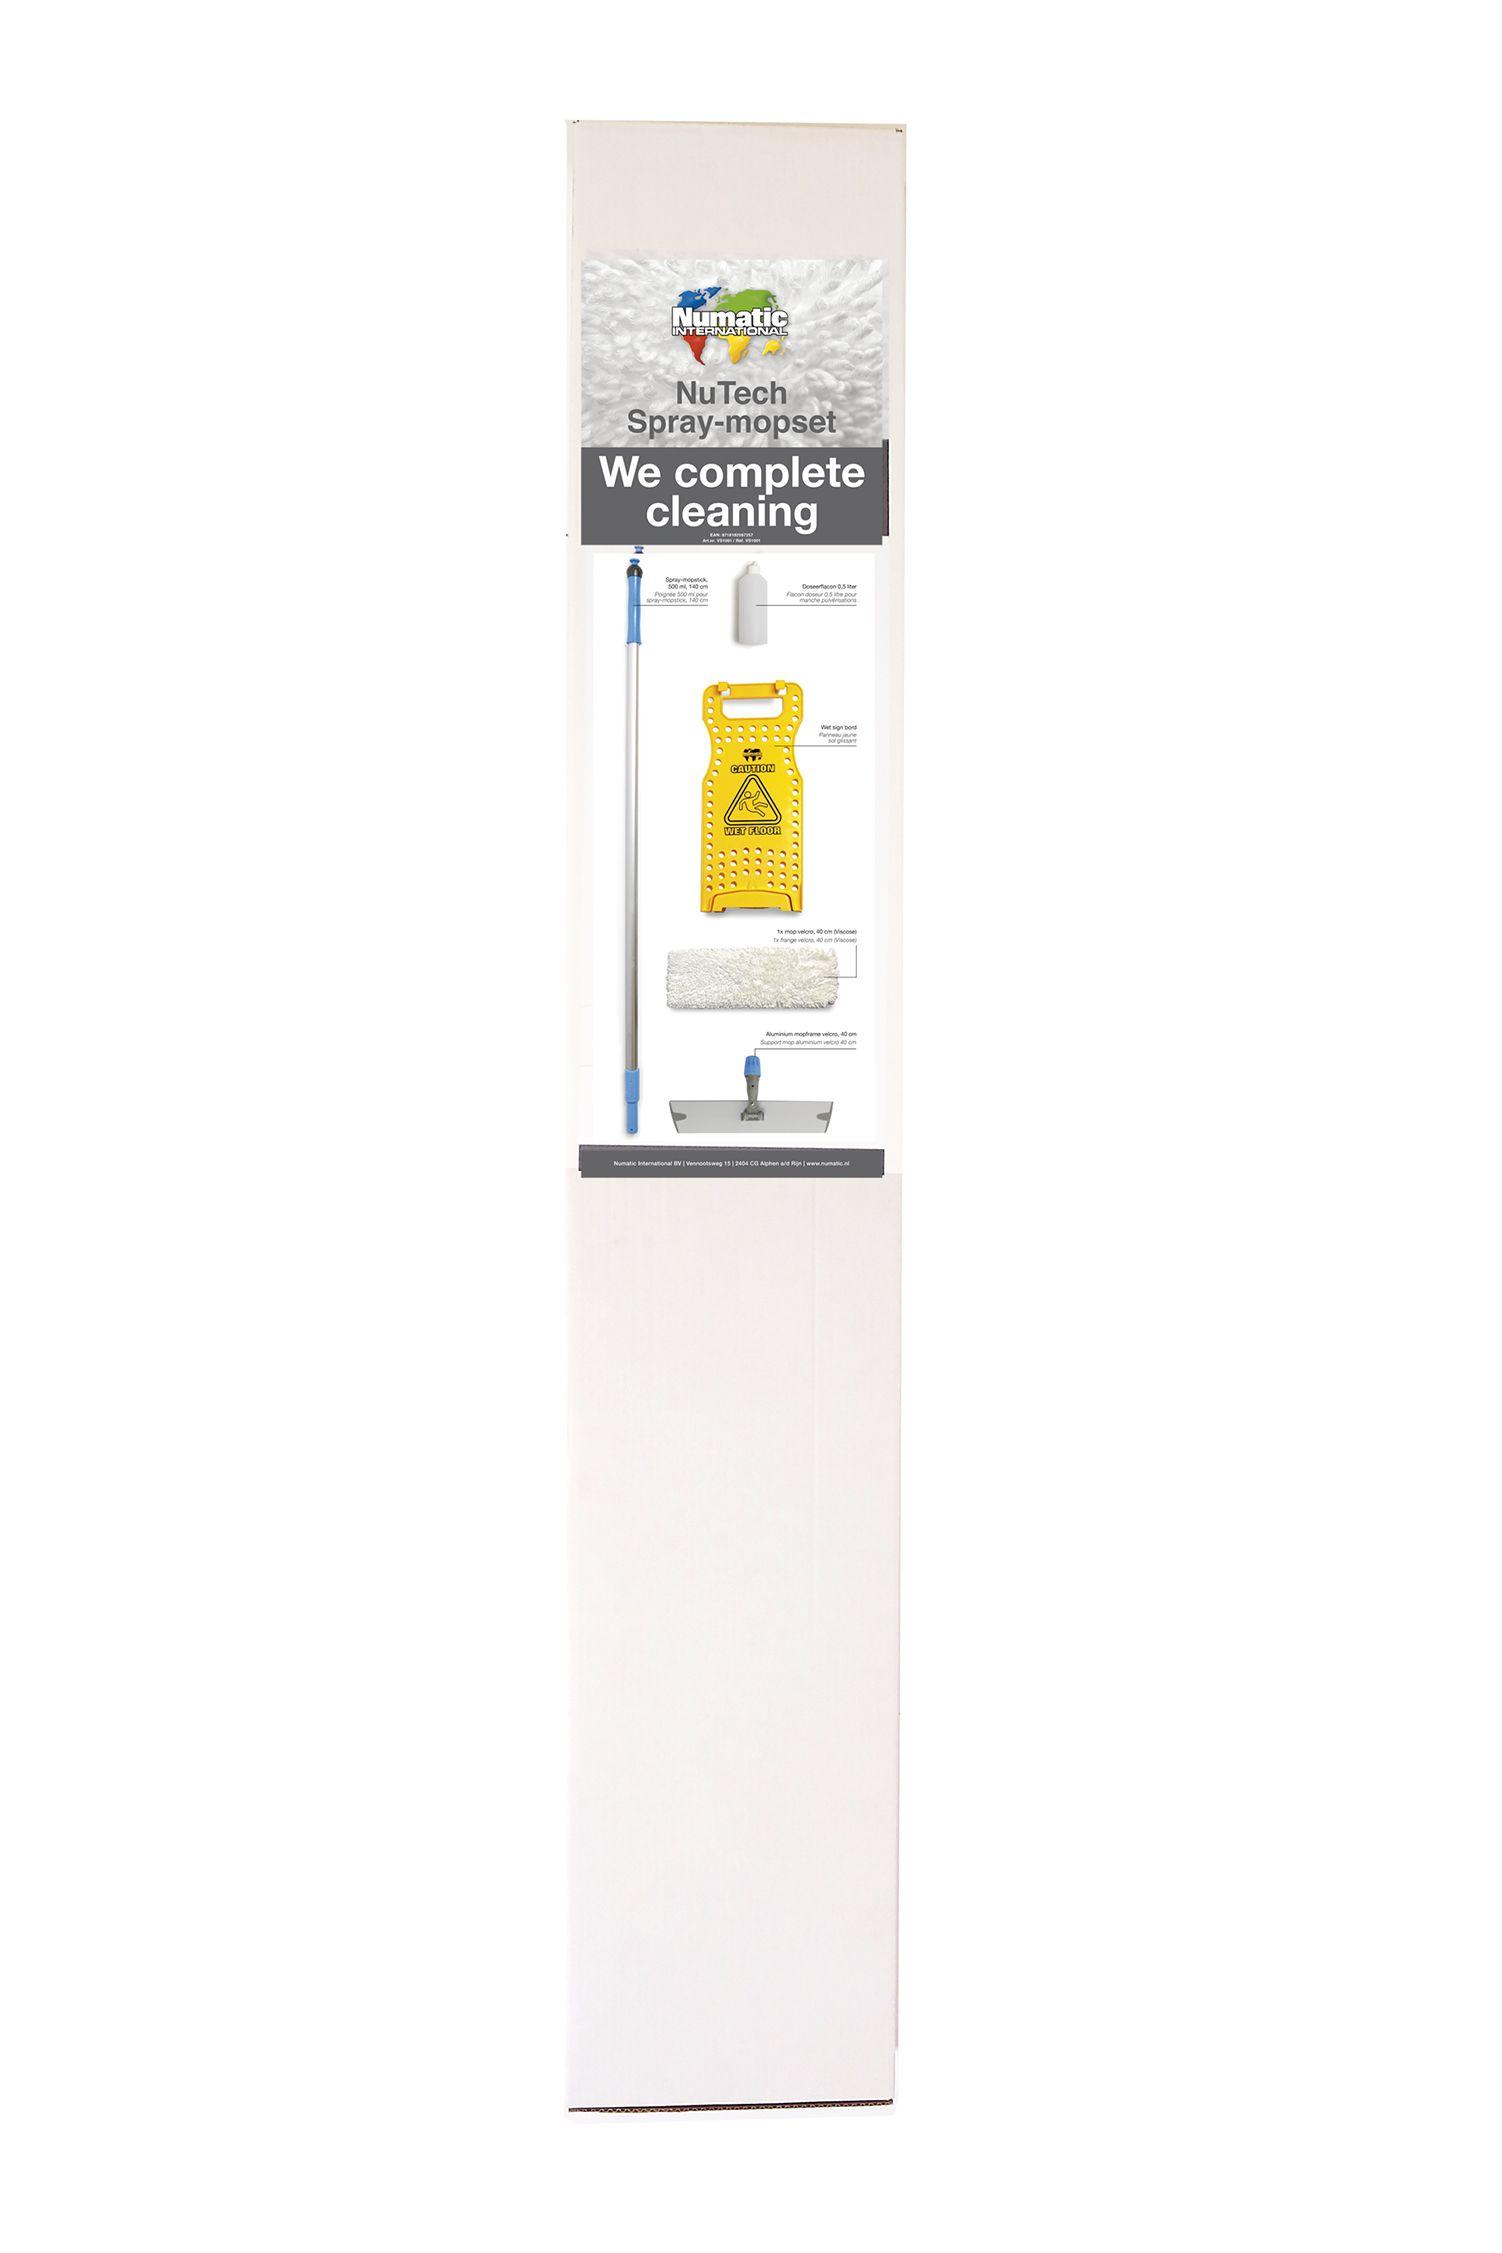 NuTech spray-mopset